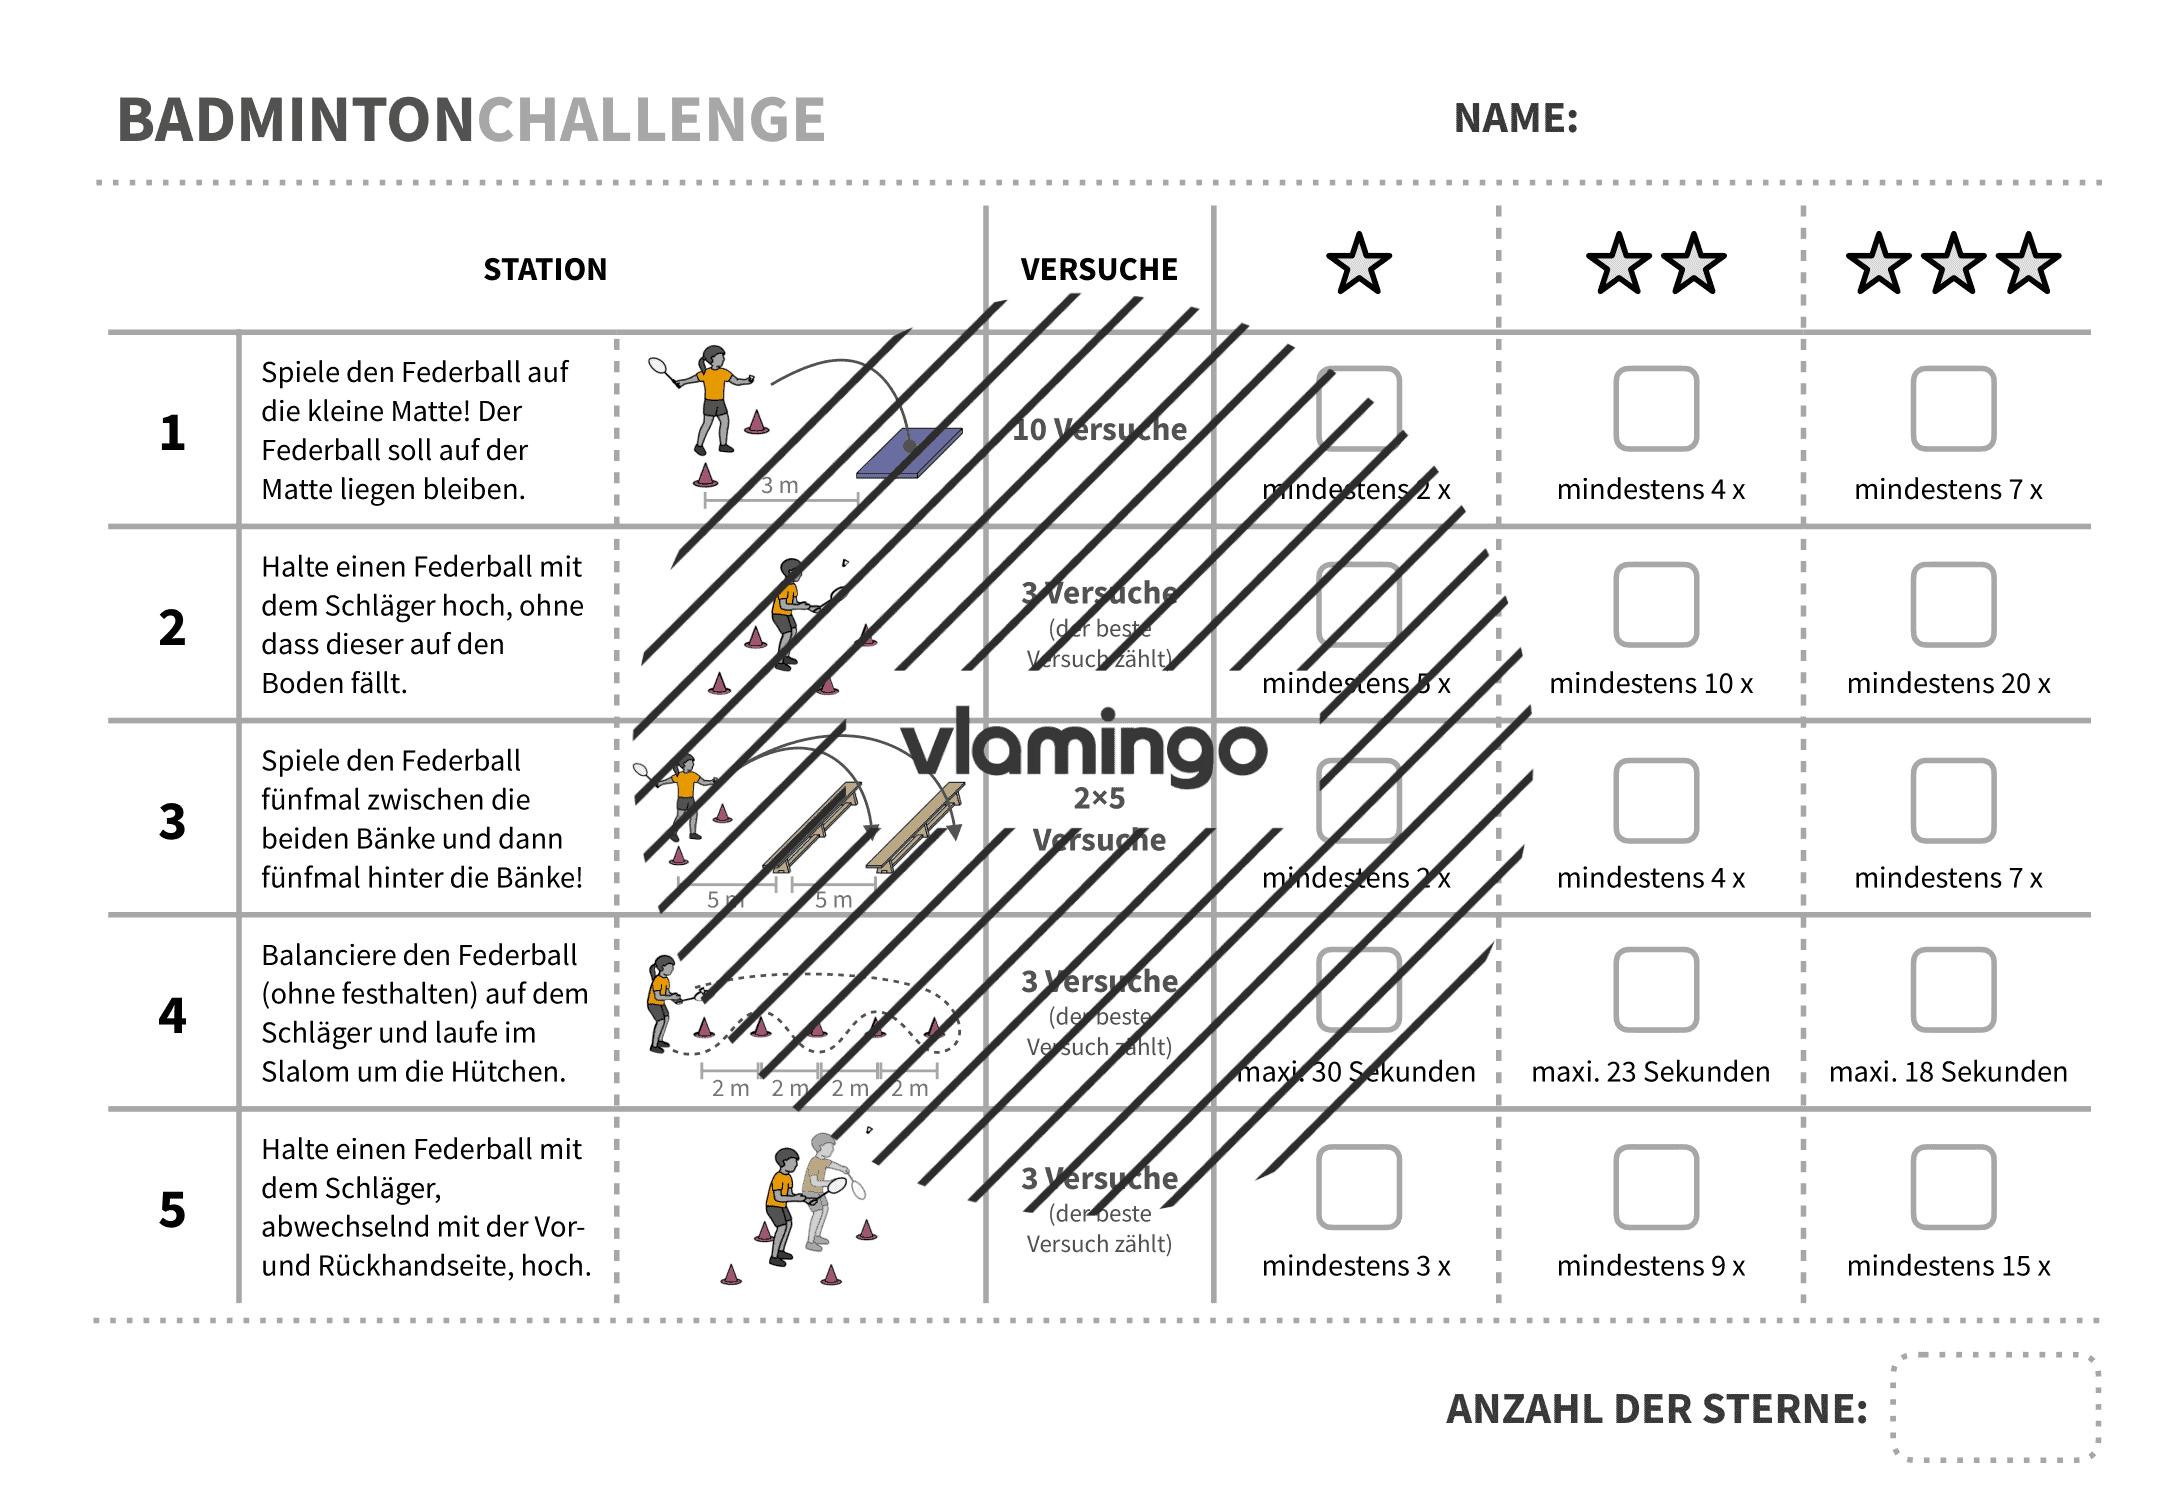 Badminton-Challenge - Laufzettel